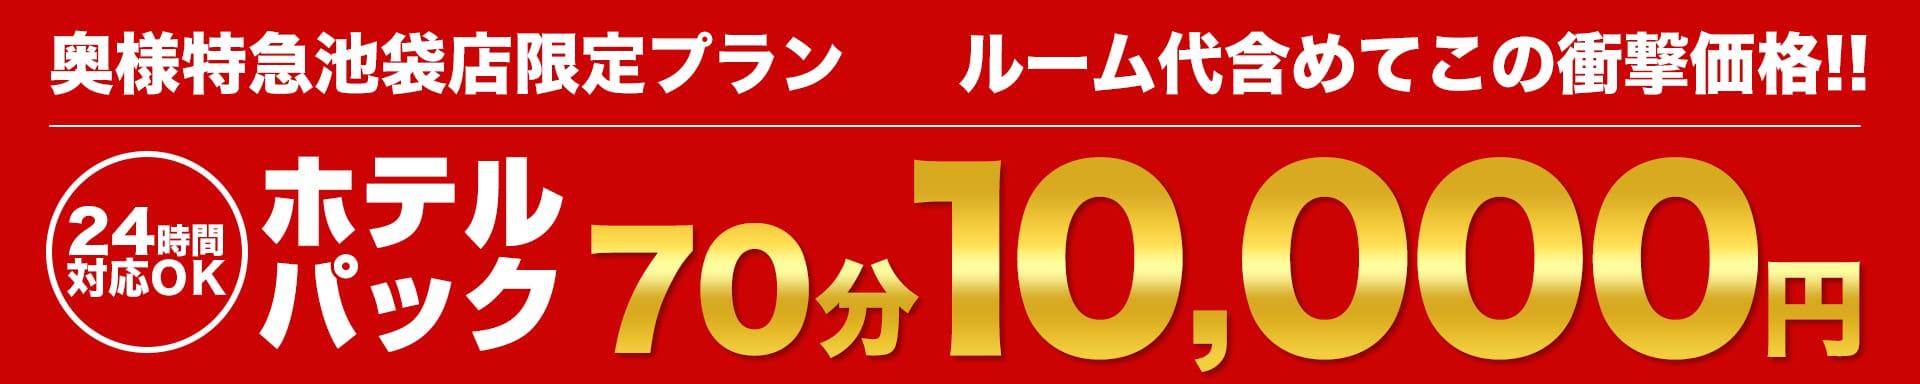 激安!奥様特急池袋大塚店 日本最安! その3